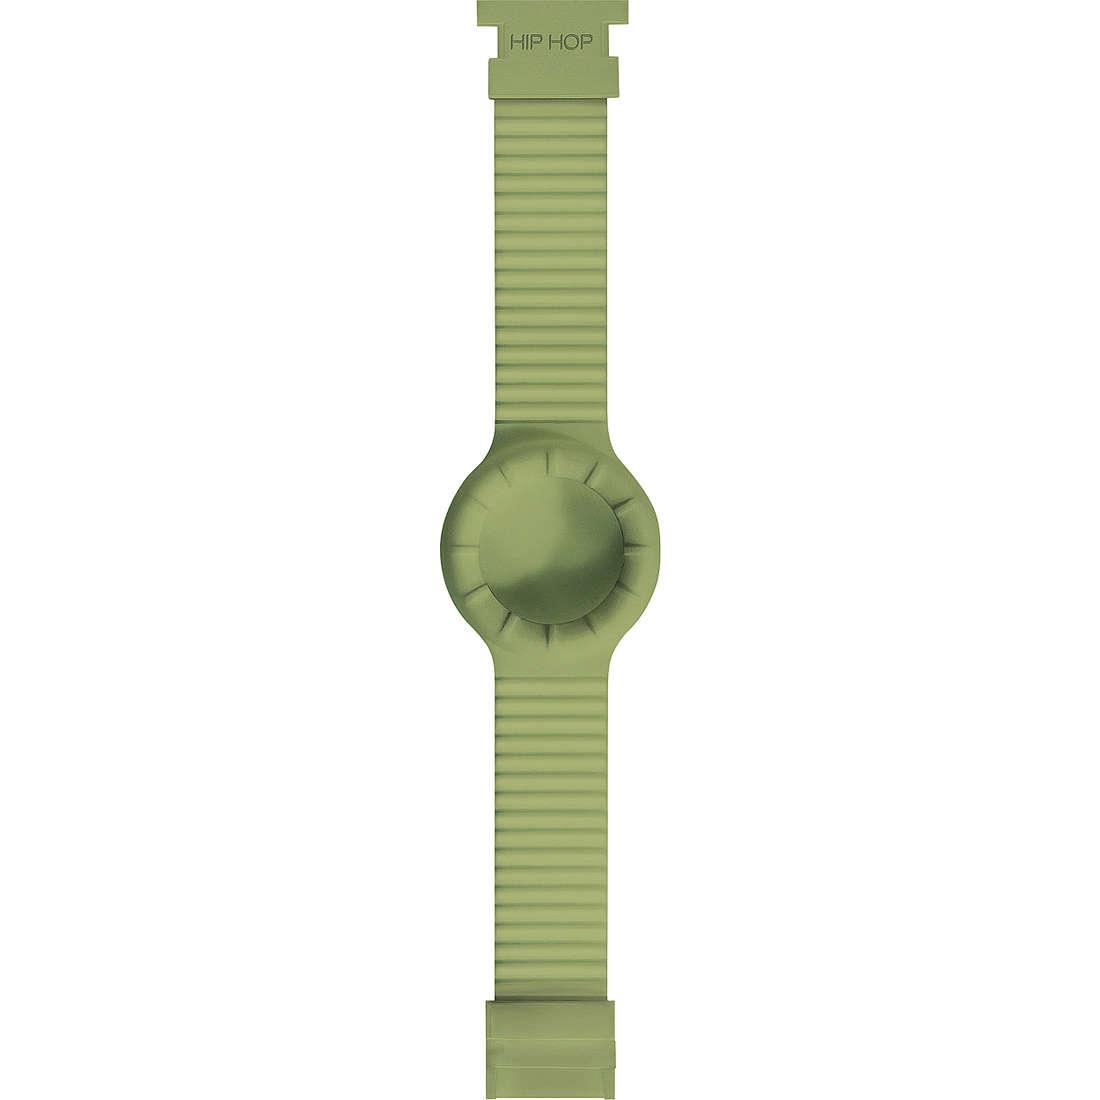 orologio accessorio unisex Hip Hop Hero HBU0233